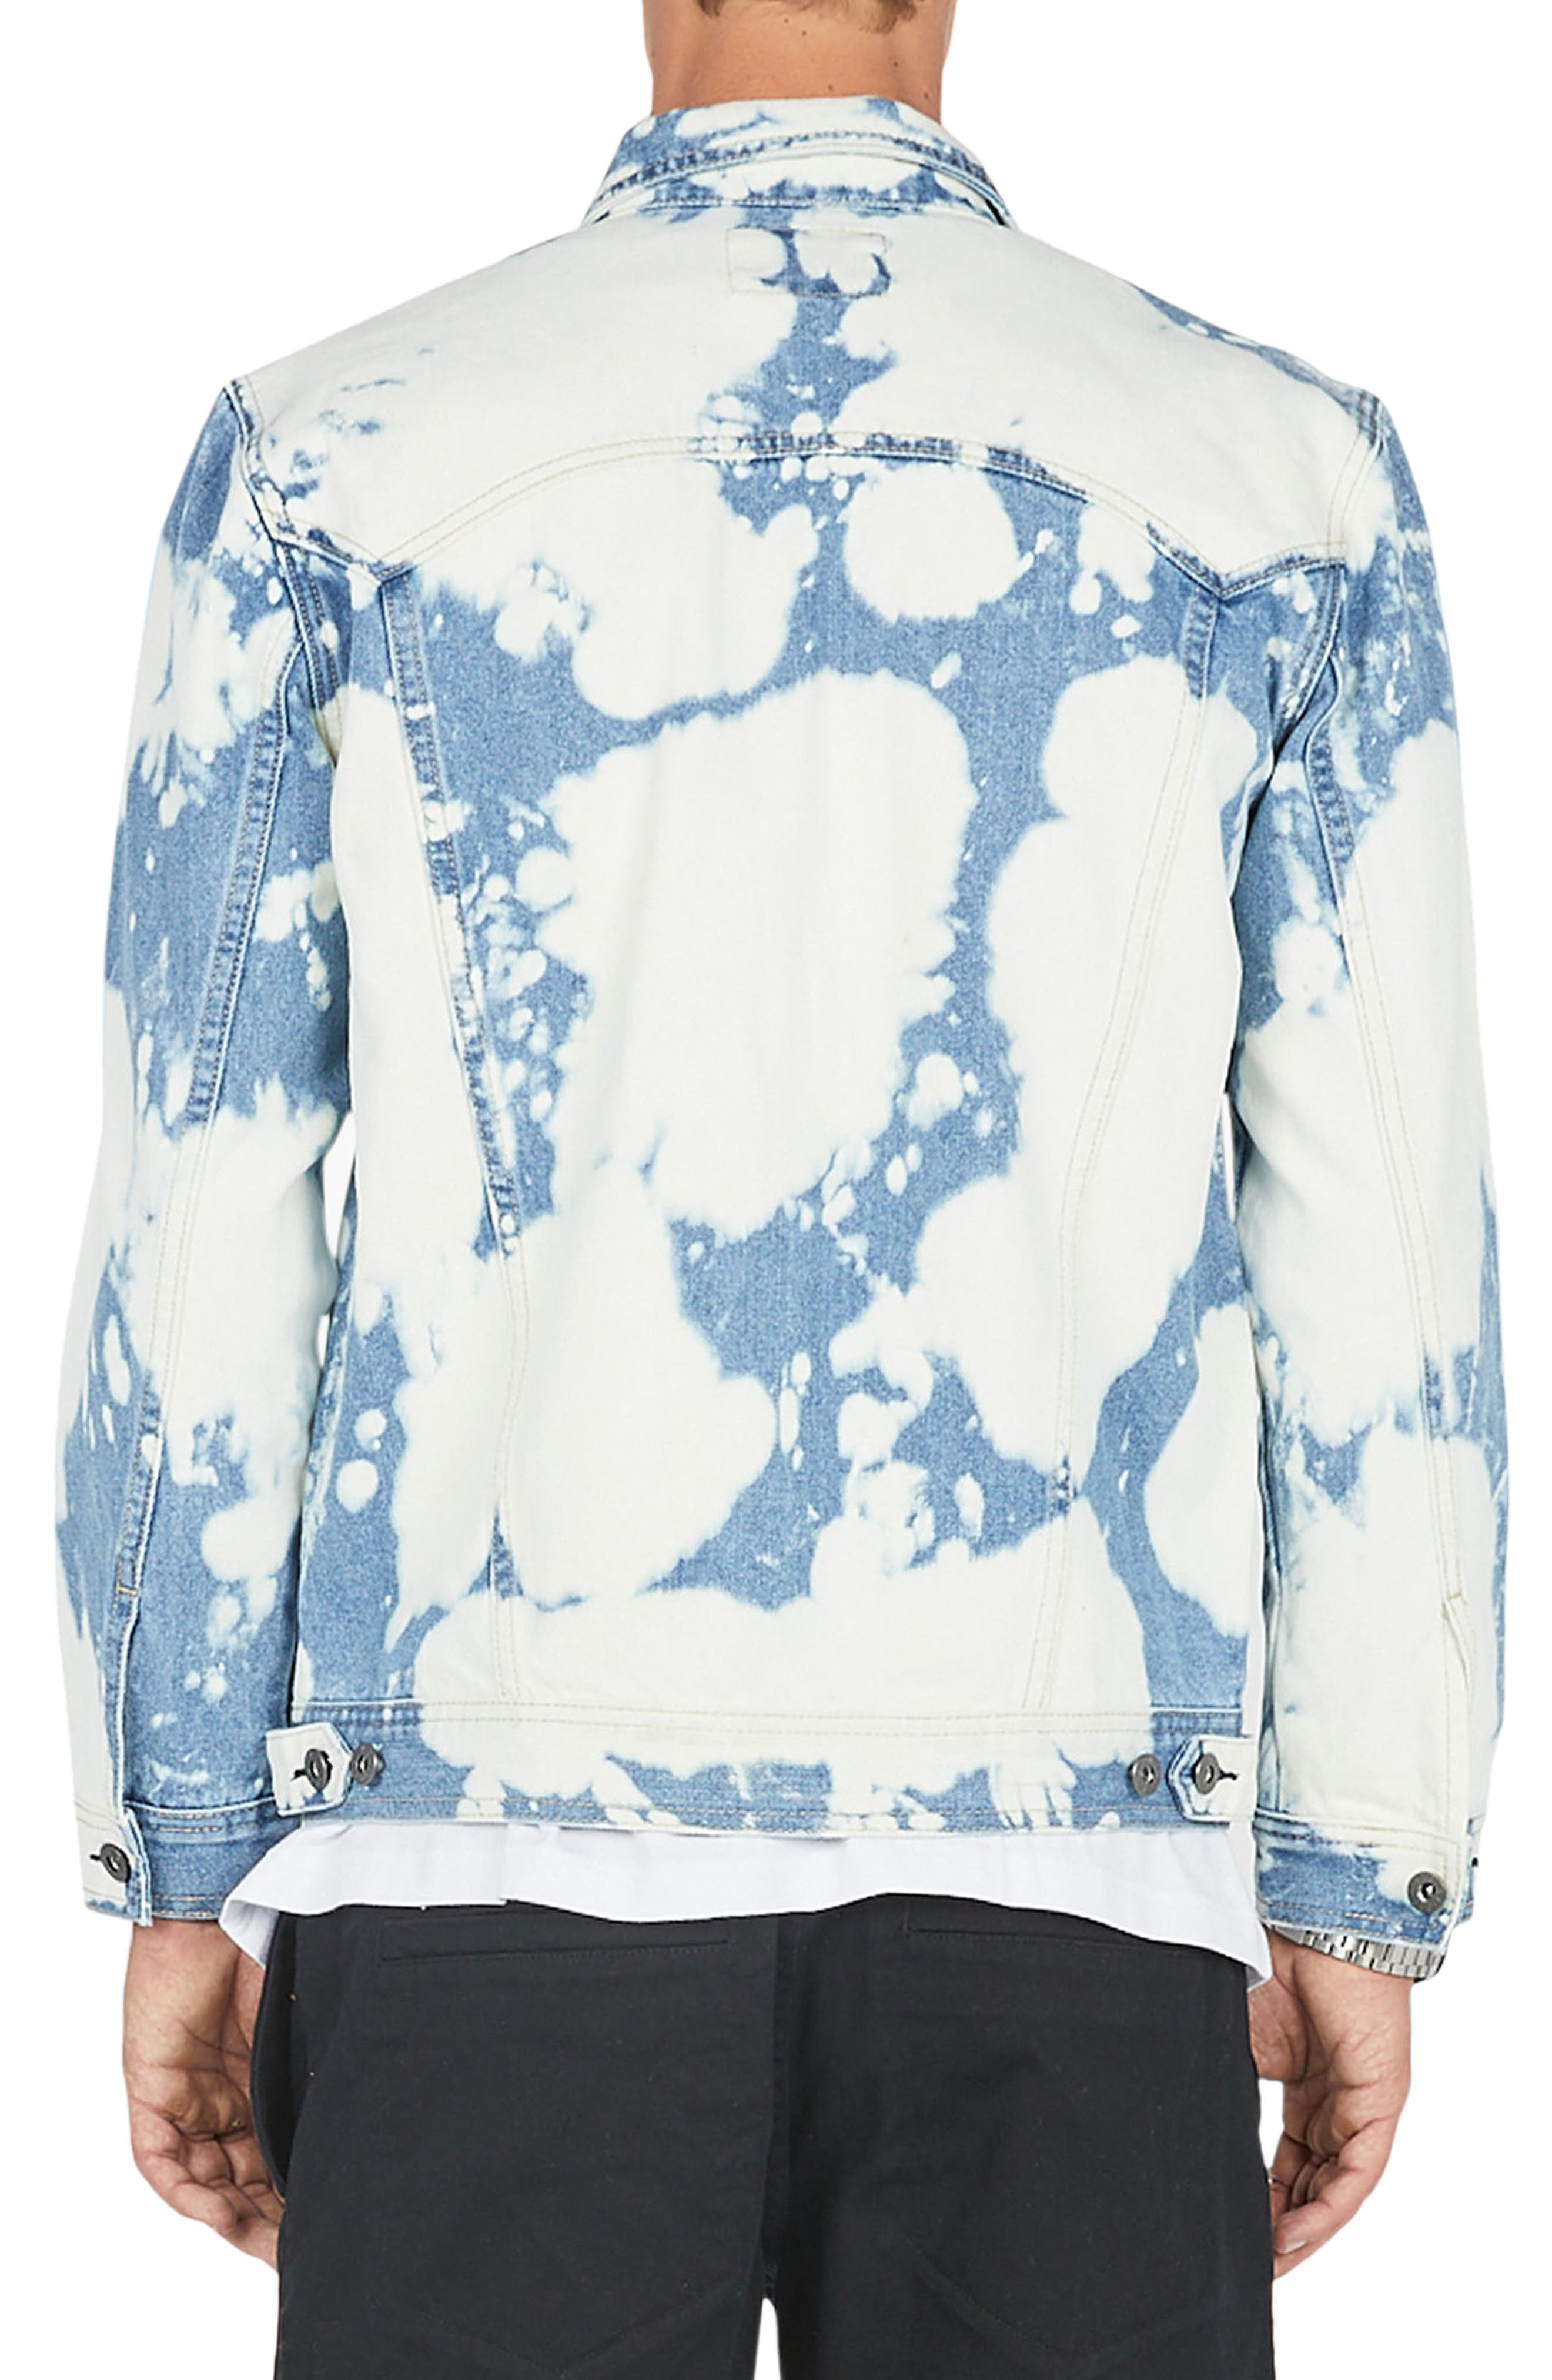 B. Rigid Denim Jacket,                             Alternate thumbnail 2, color,                             Bleached Blue